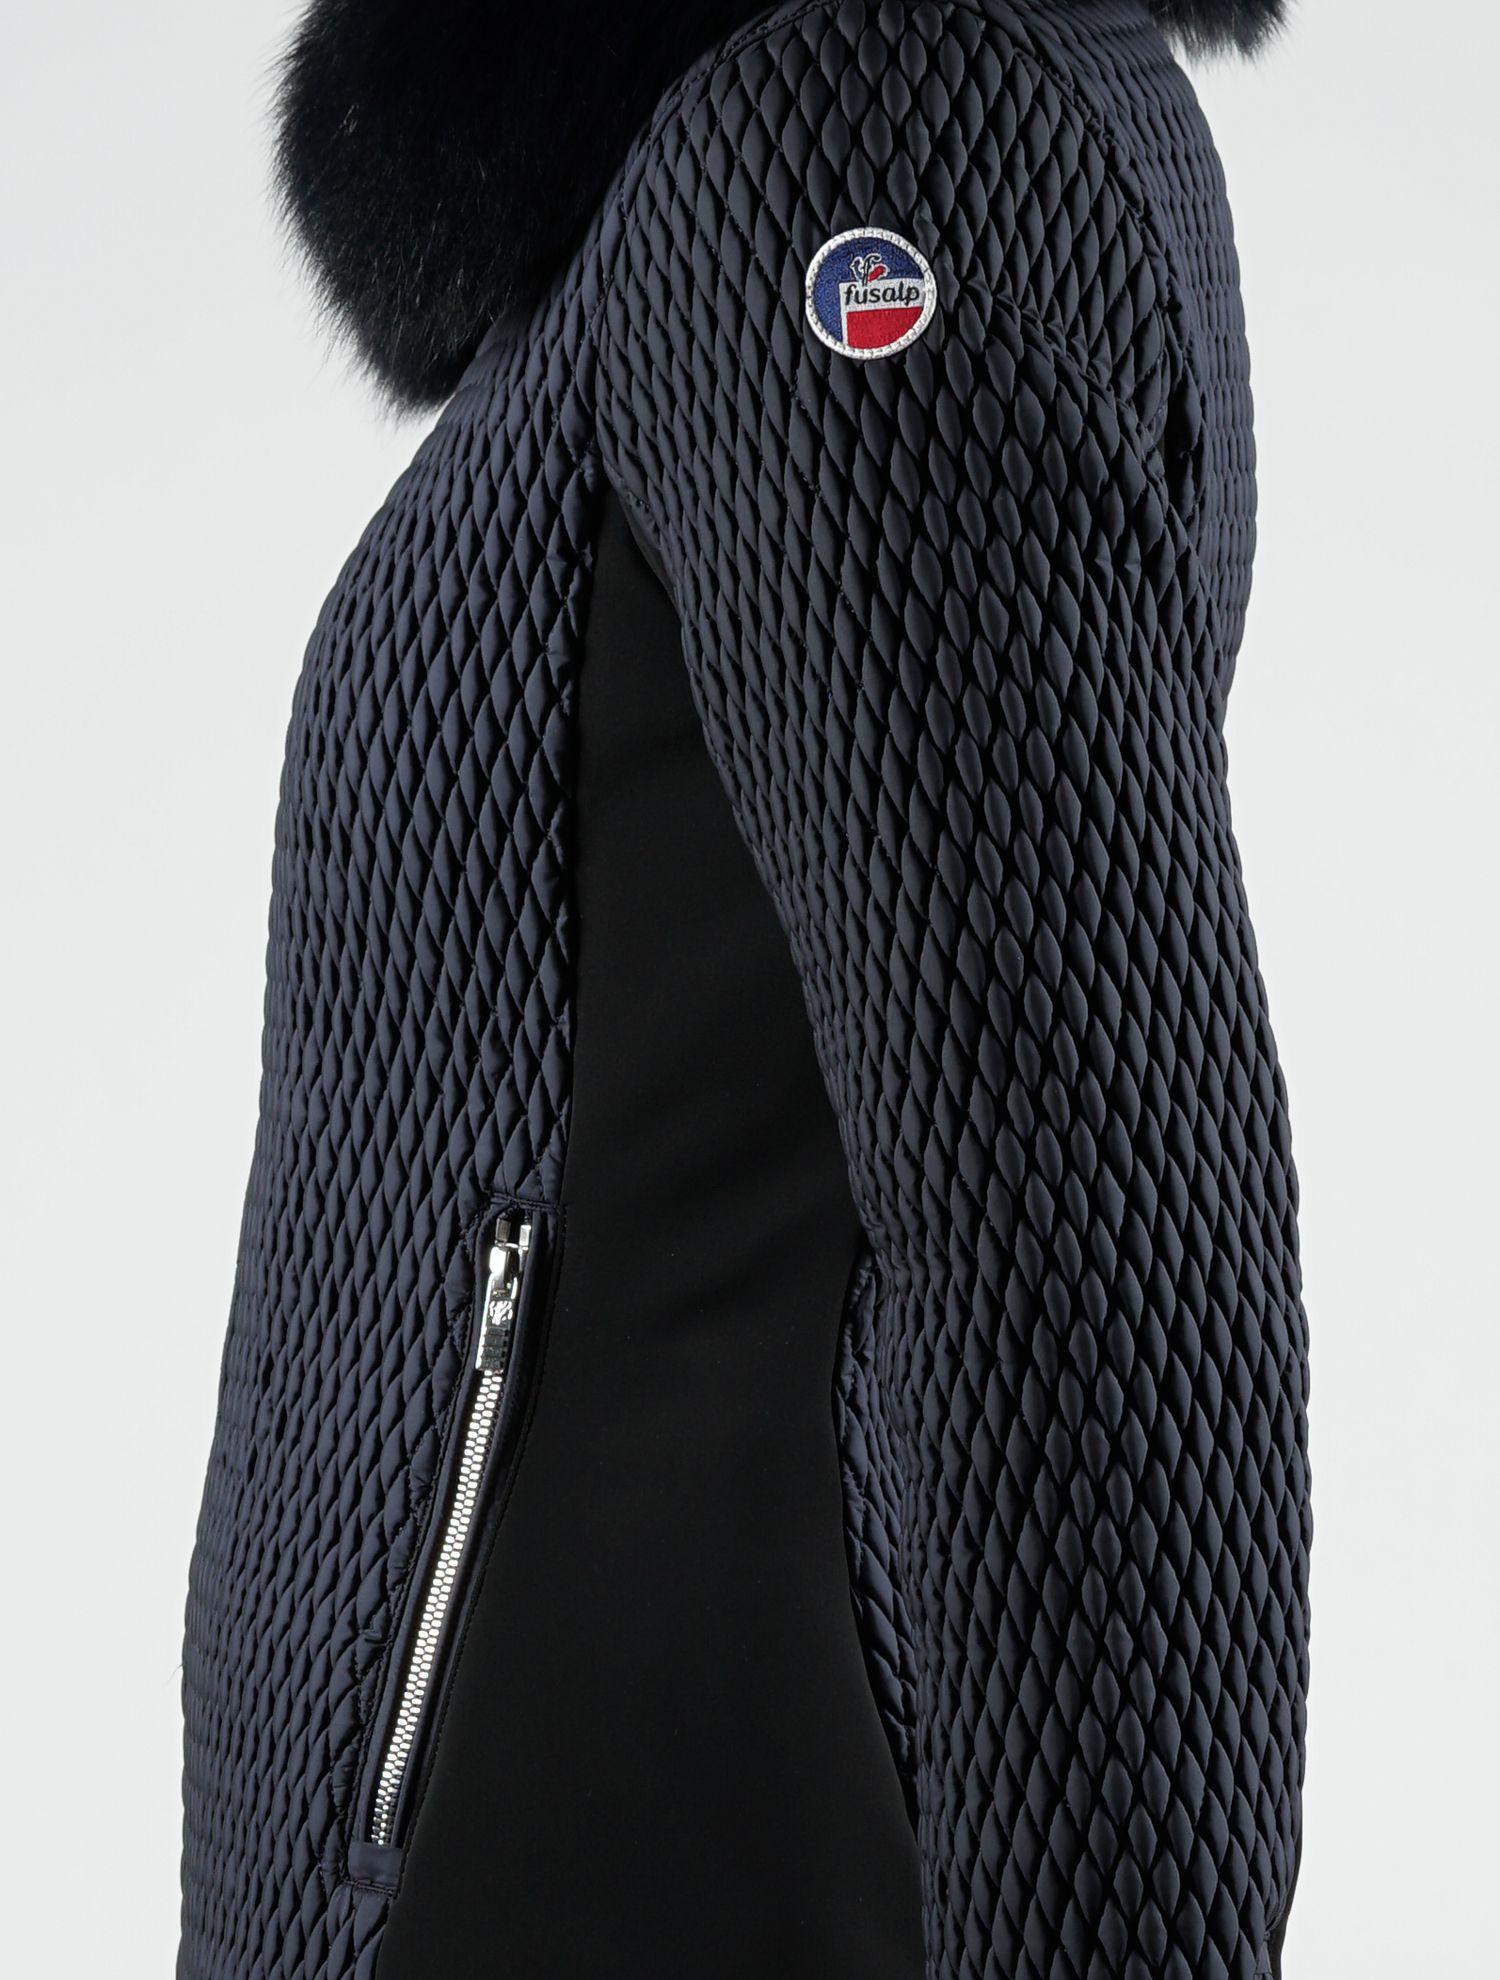 doudoune ski femme fourrure,veste ski fusalp homme